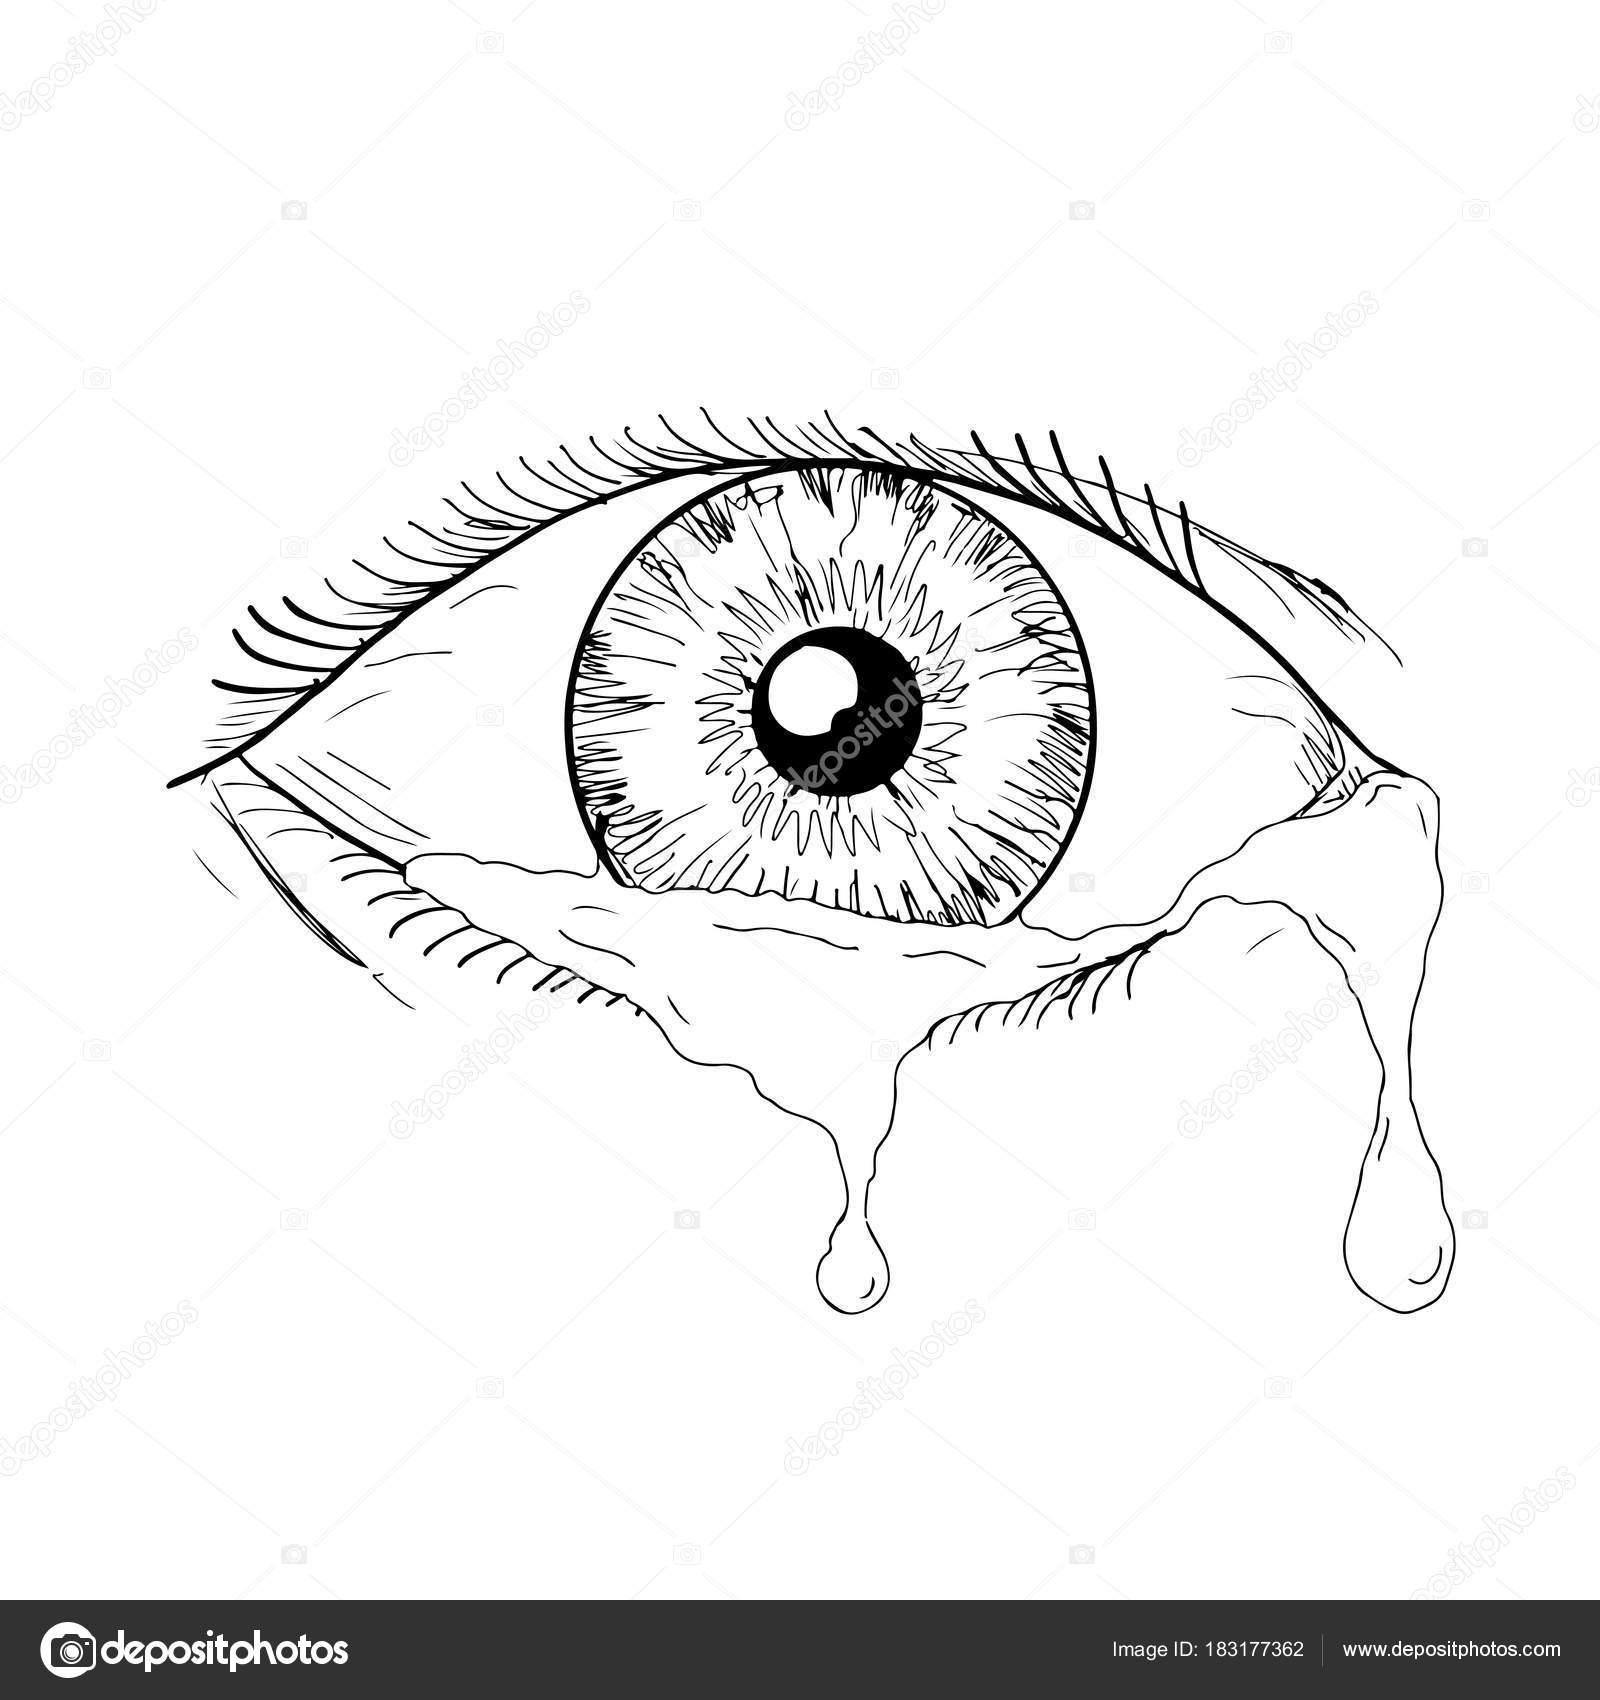 Dibujos Ojos Llorando Dibujo Ojo Humano Llorando Lágrimas Que